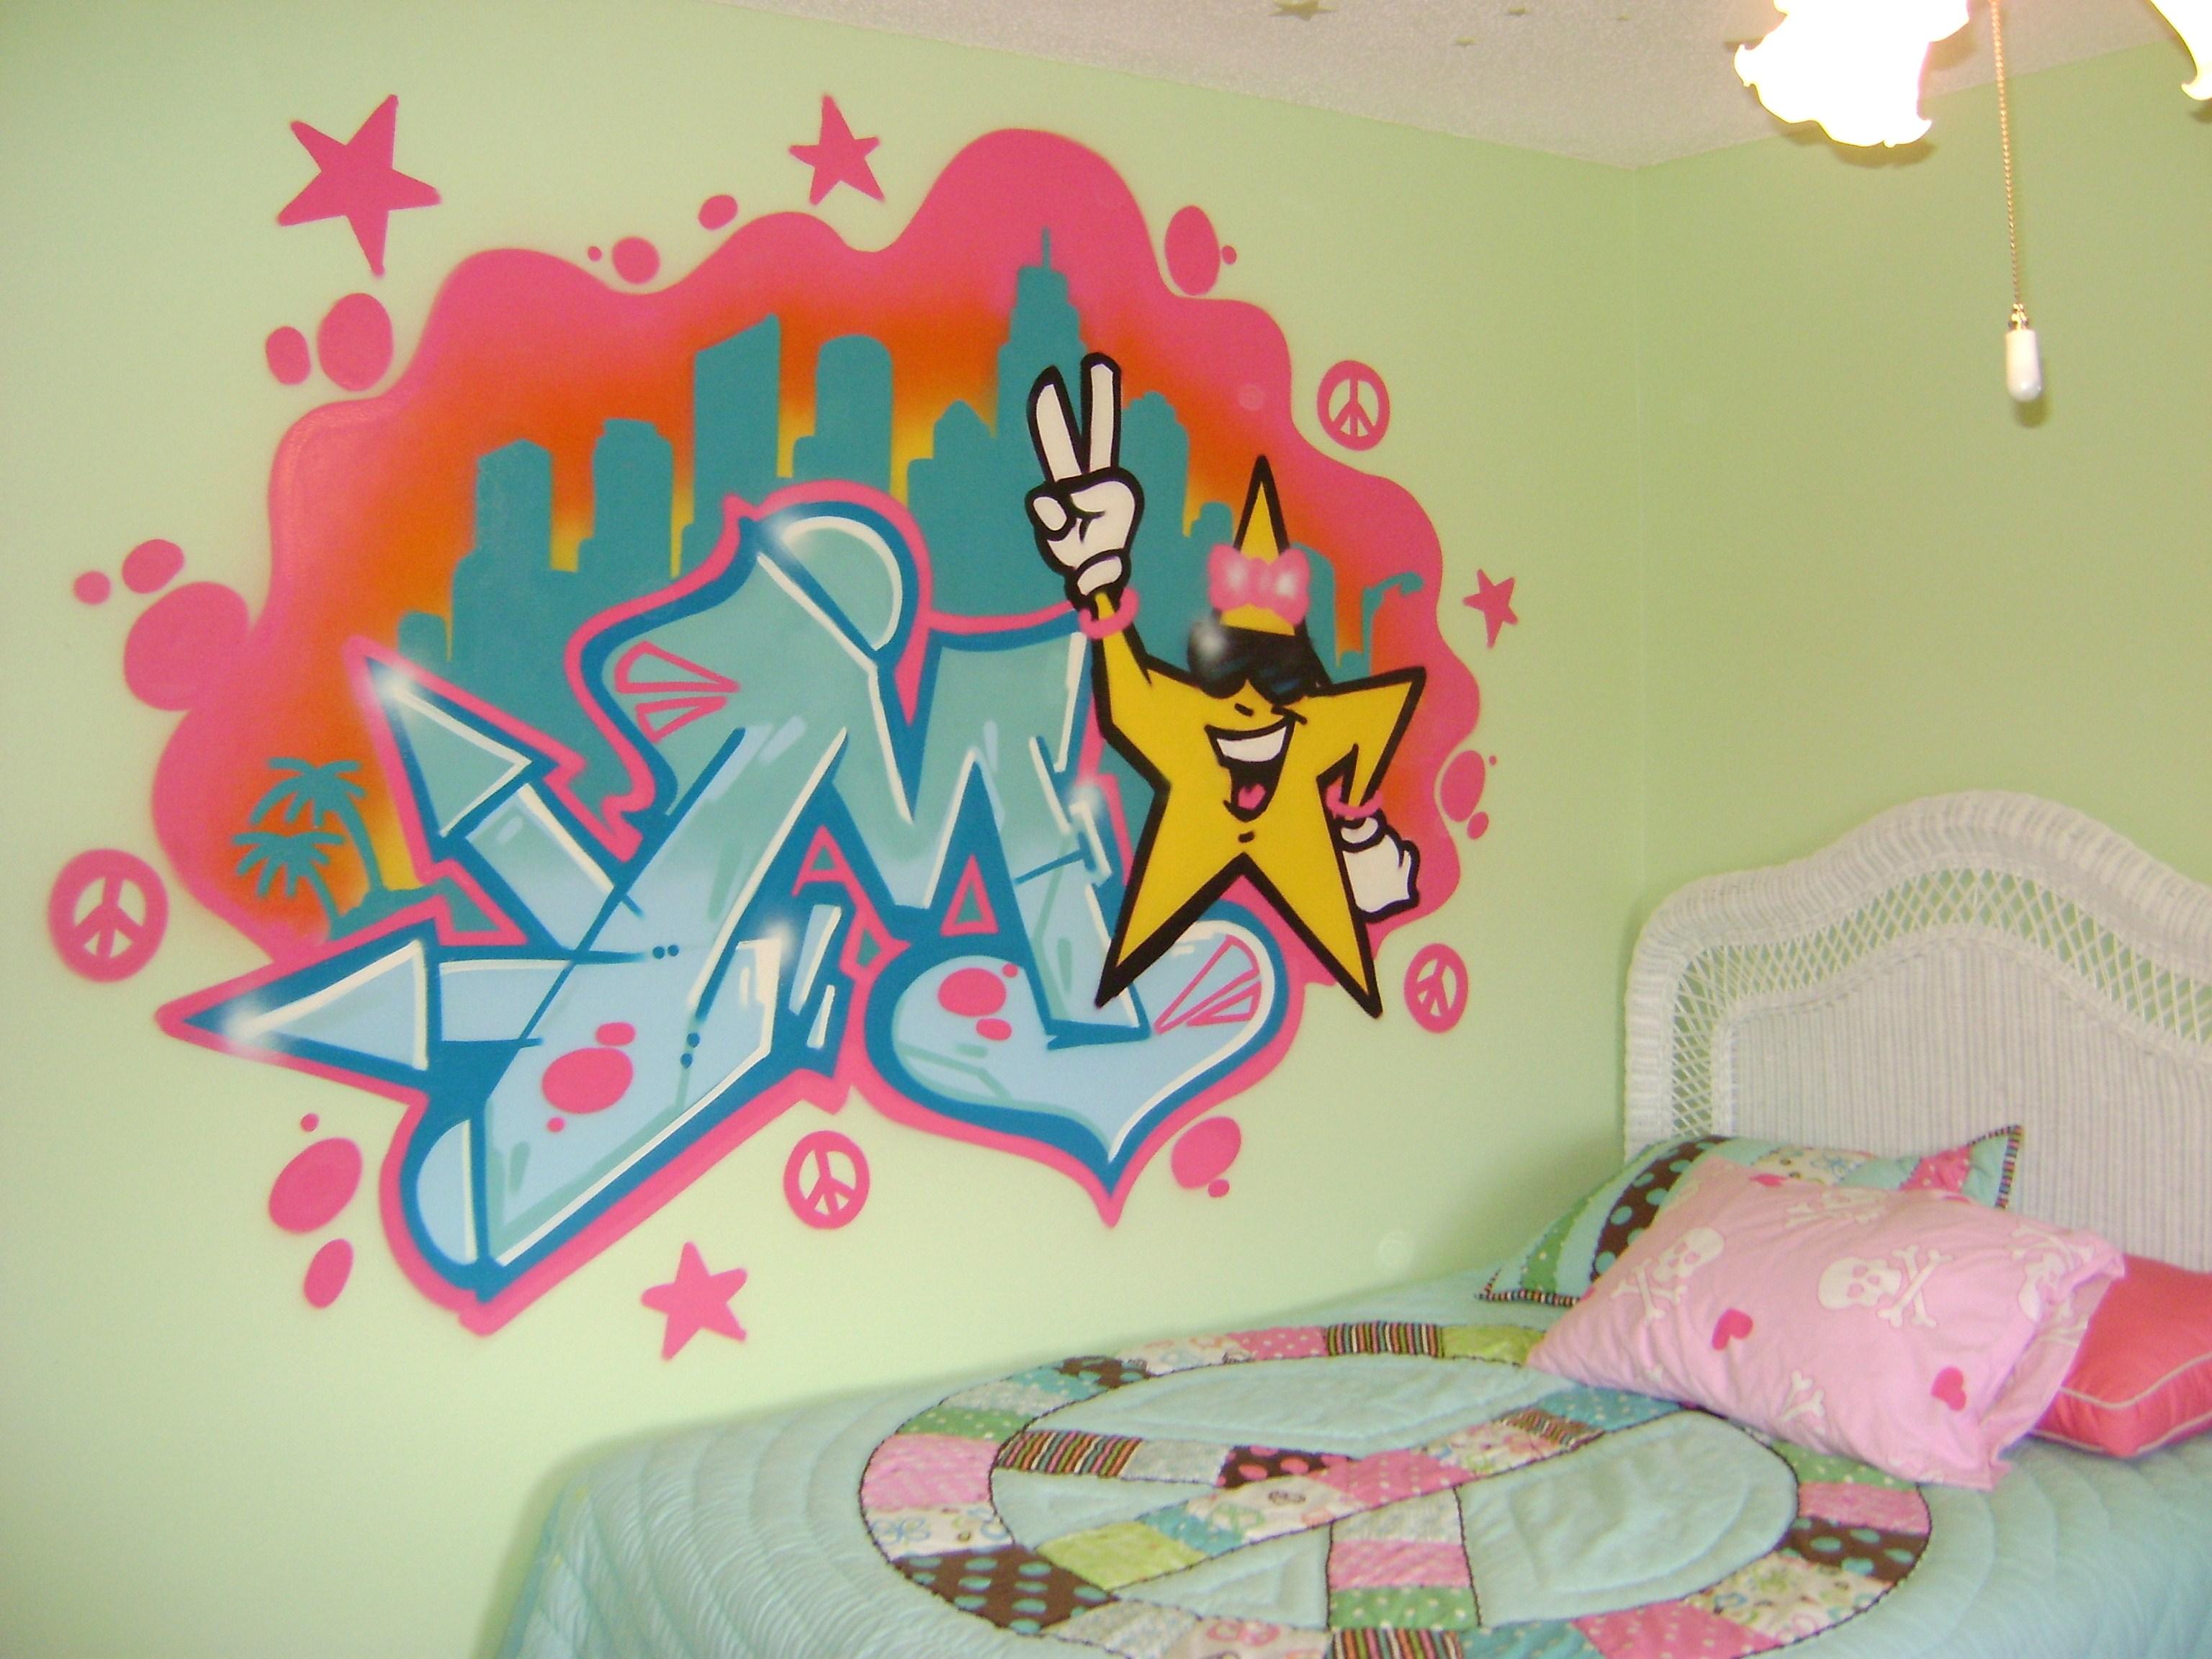 Image Gallery madison graffiti letters